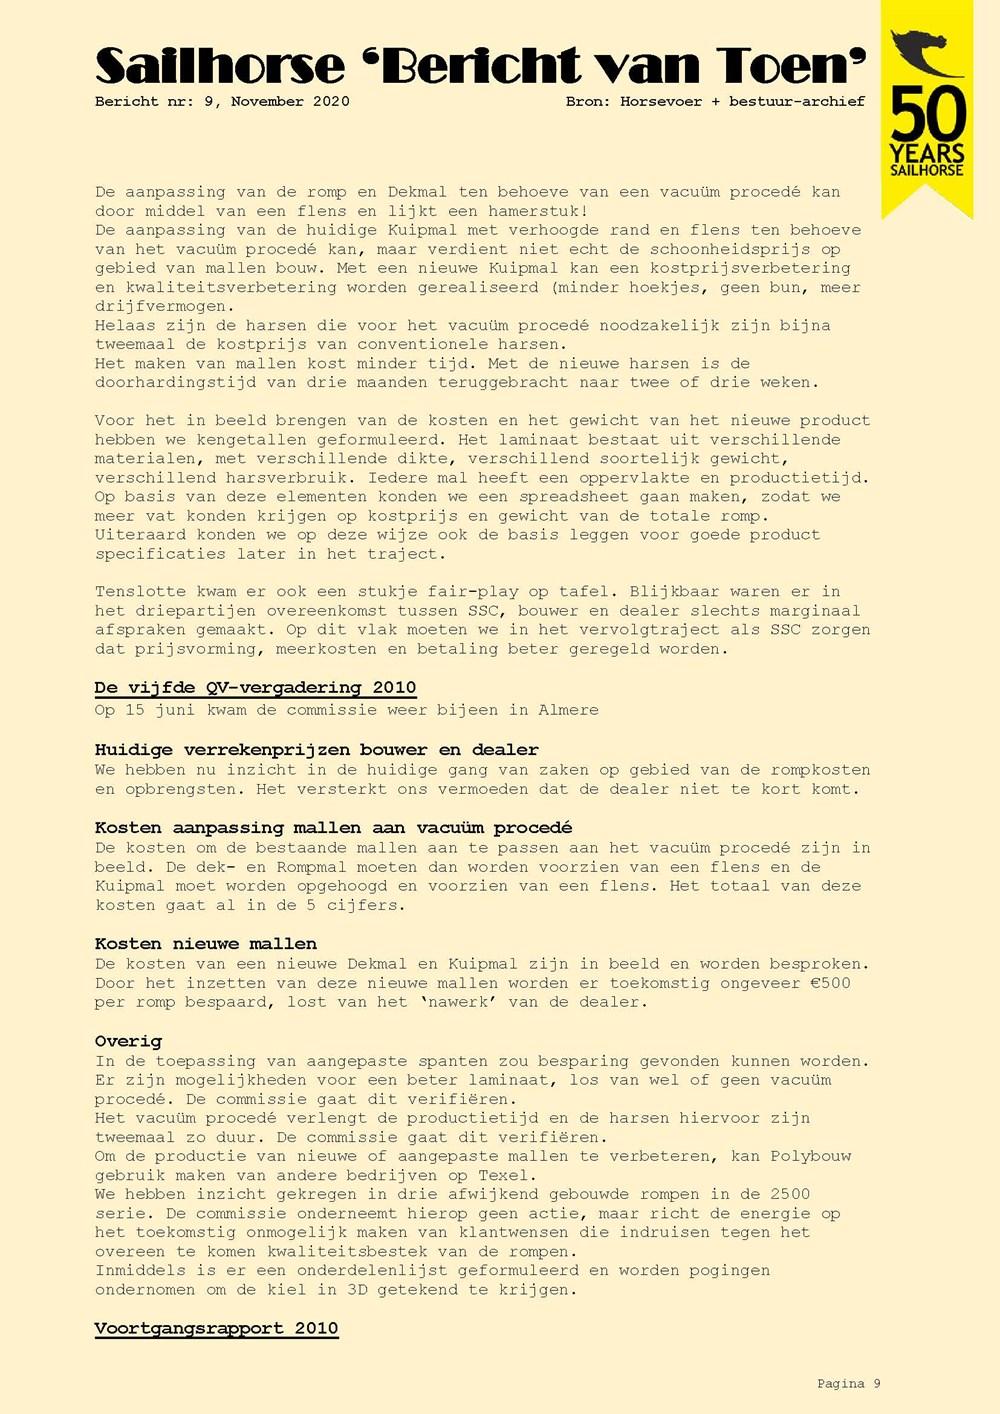 BvT09_Page_09.jpg